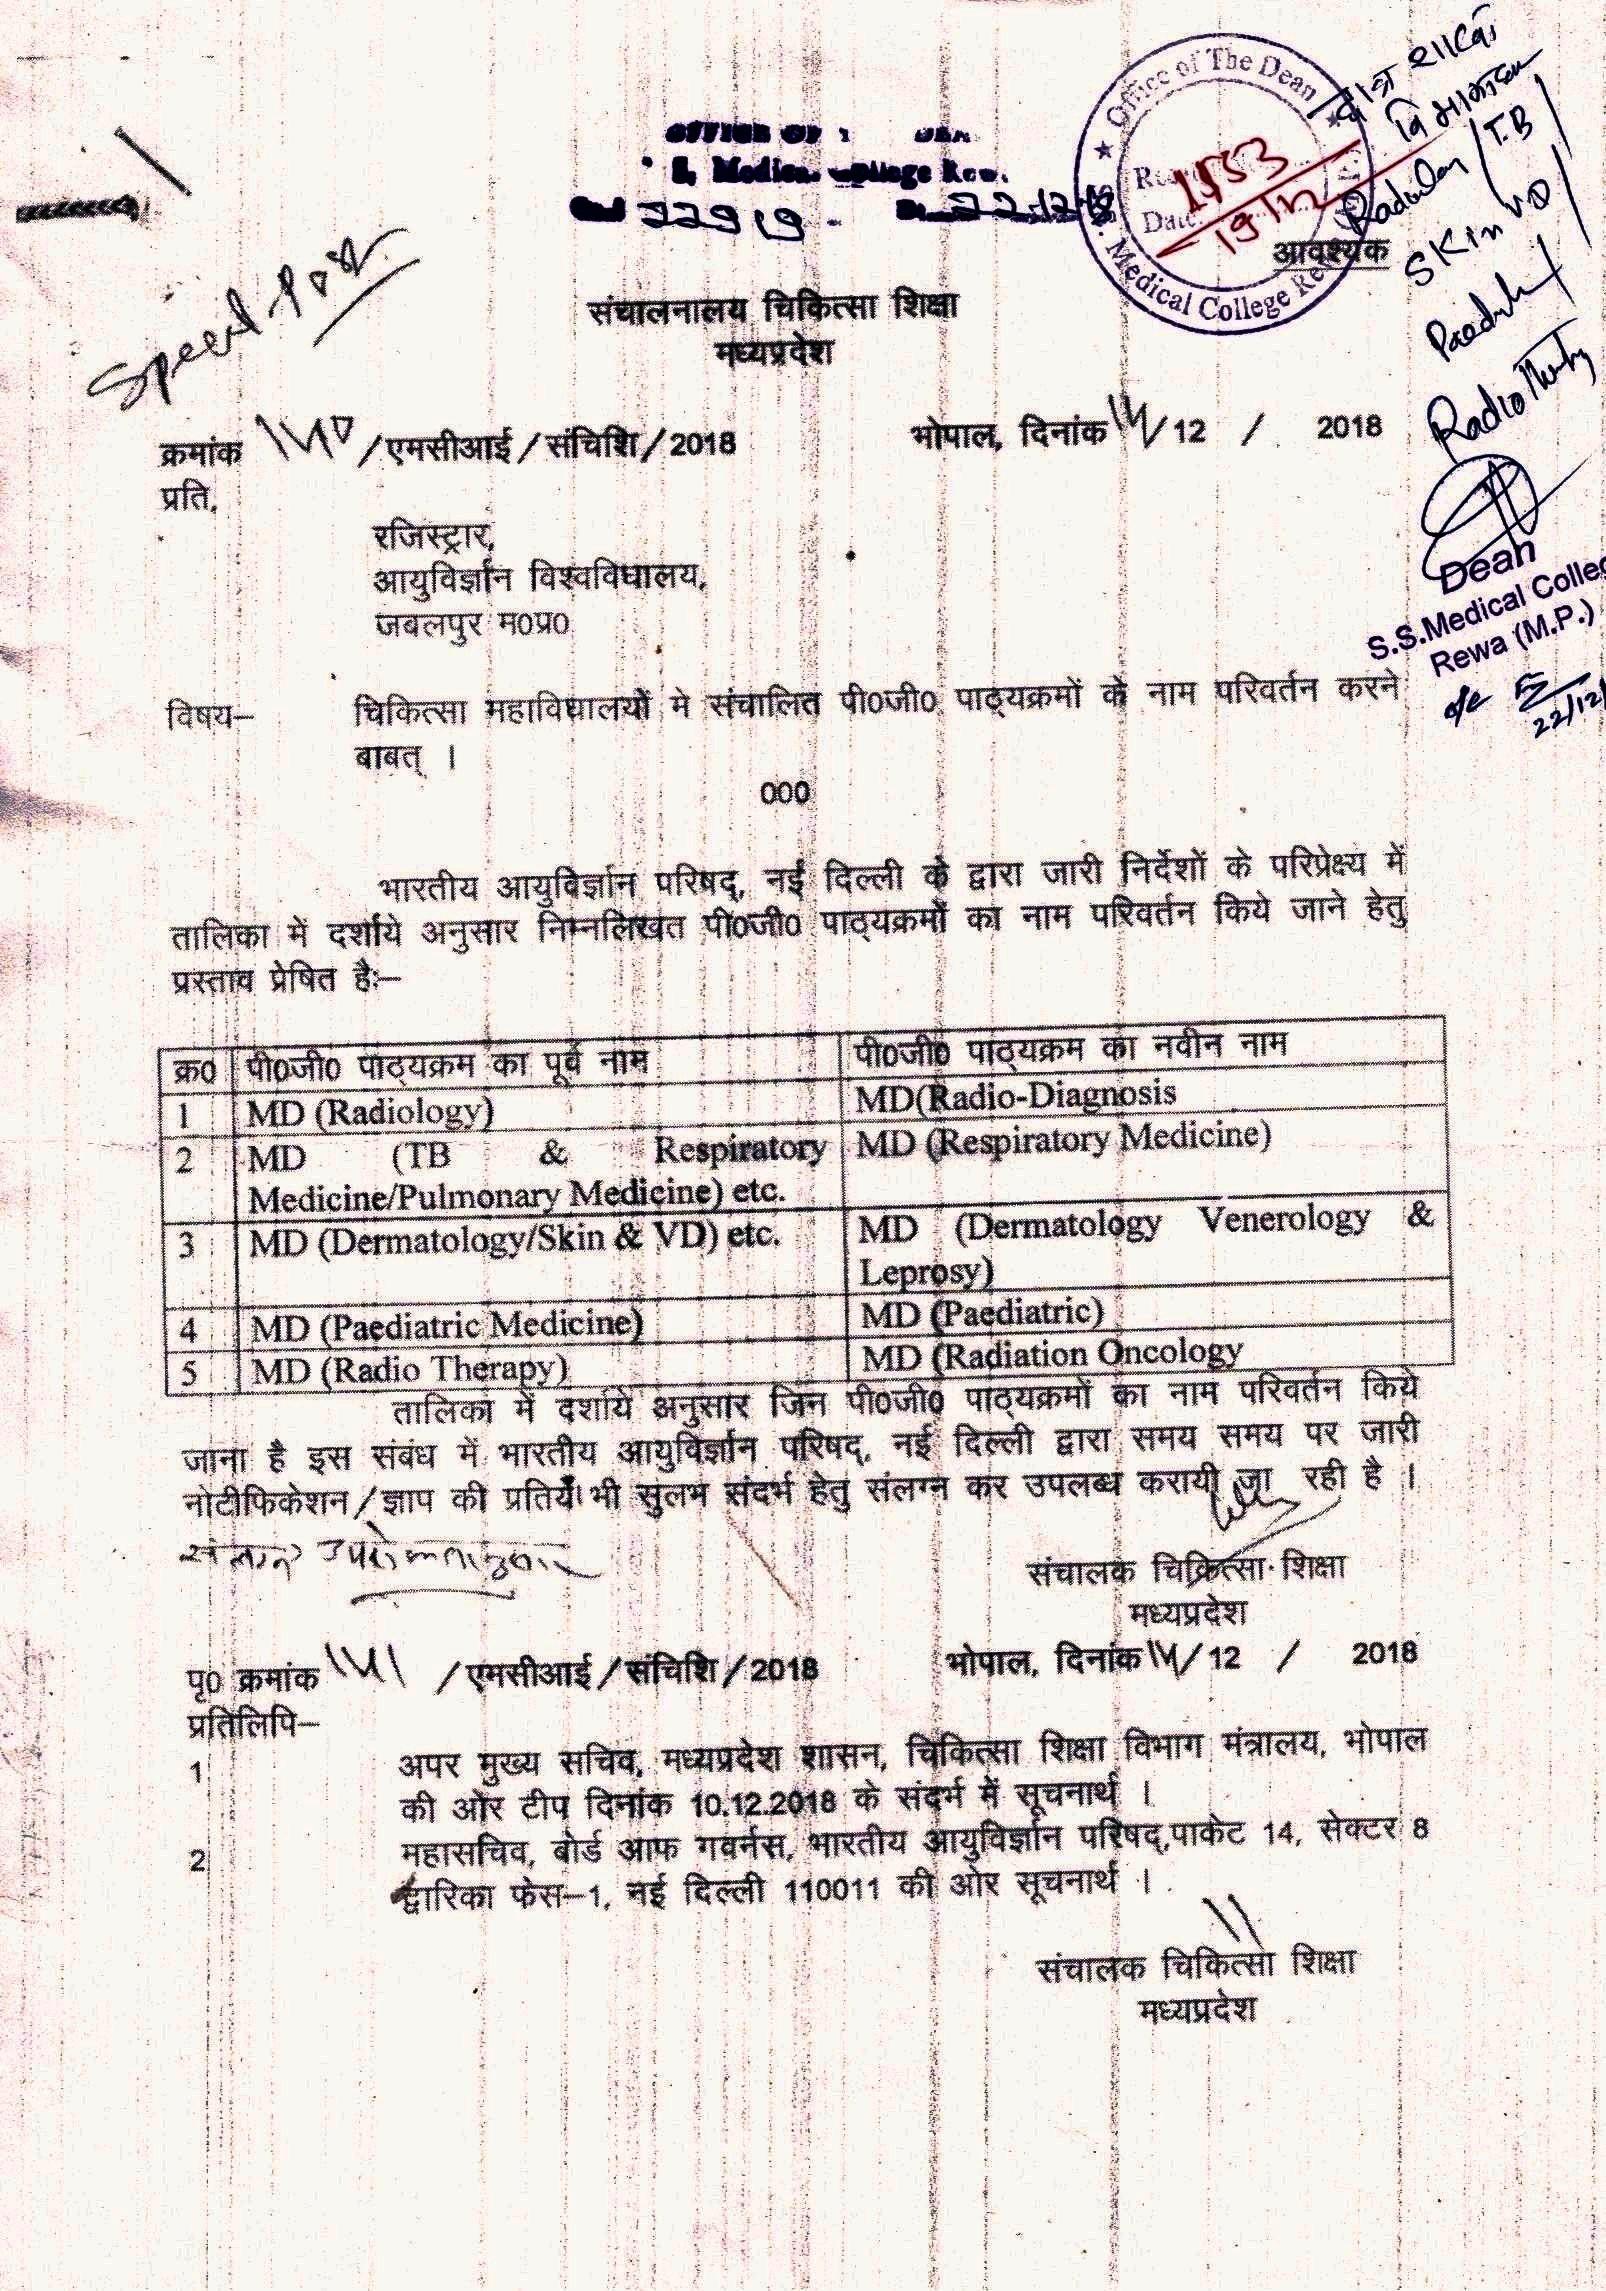 Official Website Shyam Shah Medical College Rewa, Sanjay Gandhi